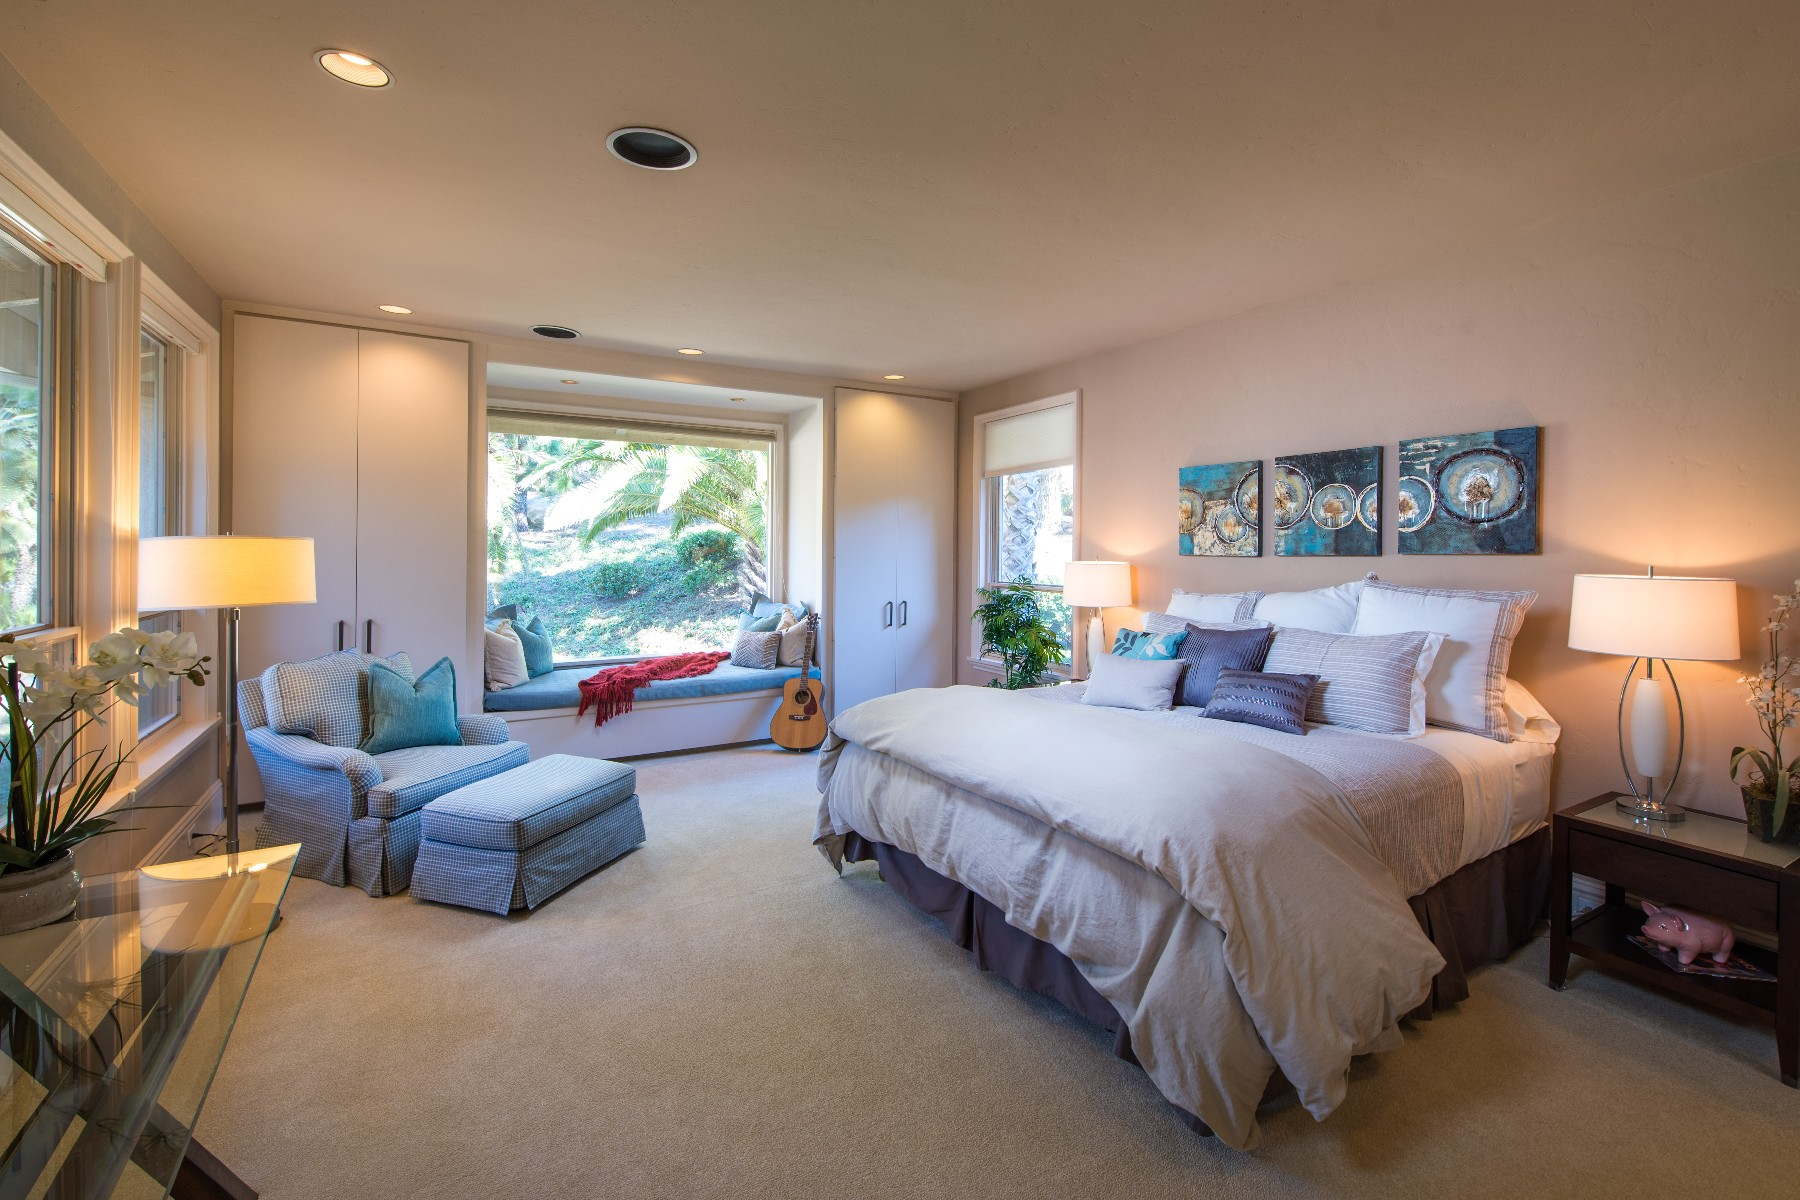 Additional photo for property listing at 4611 La Noria  Rancho Santa Fe, 加利福尼亚州 92067 美国